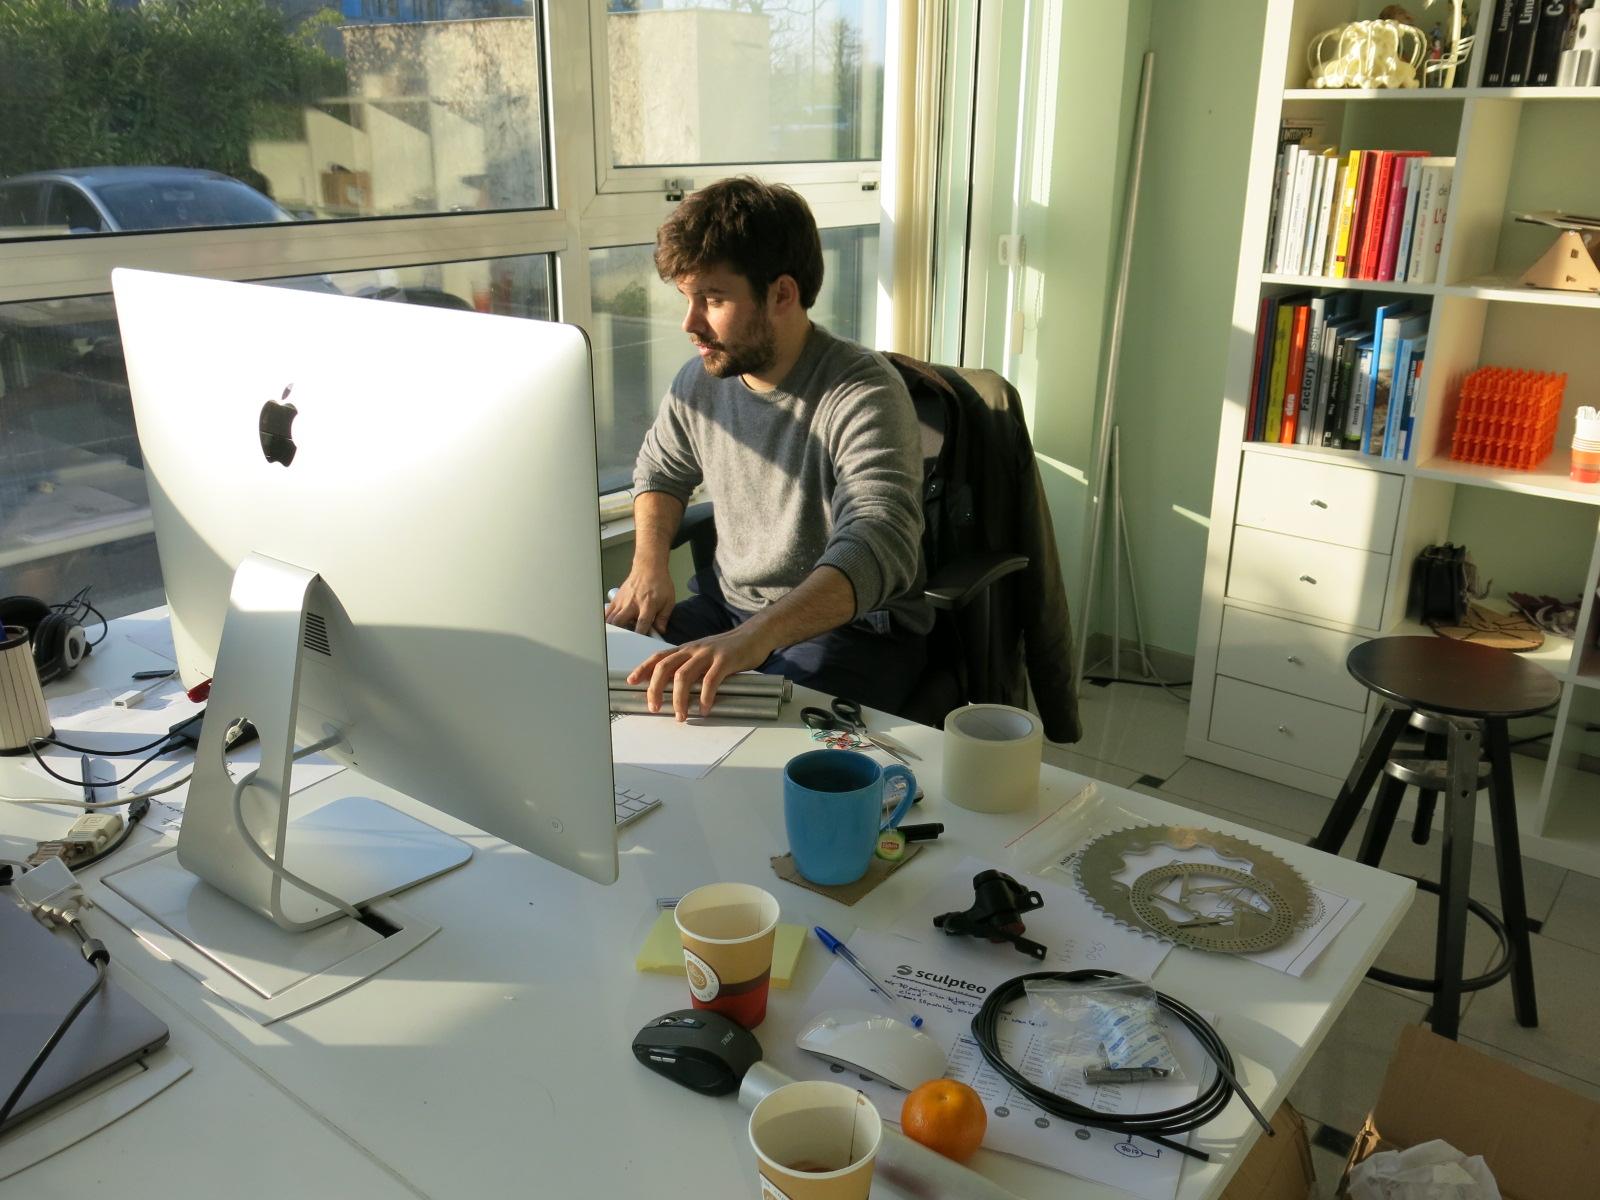 Alexandre d'Orsetti designing the Darwin Bike